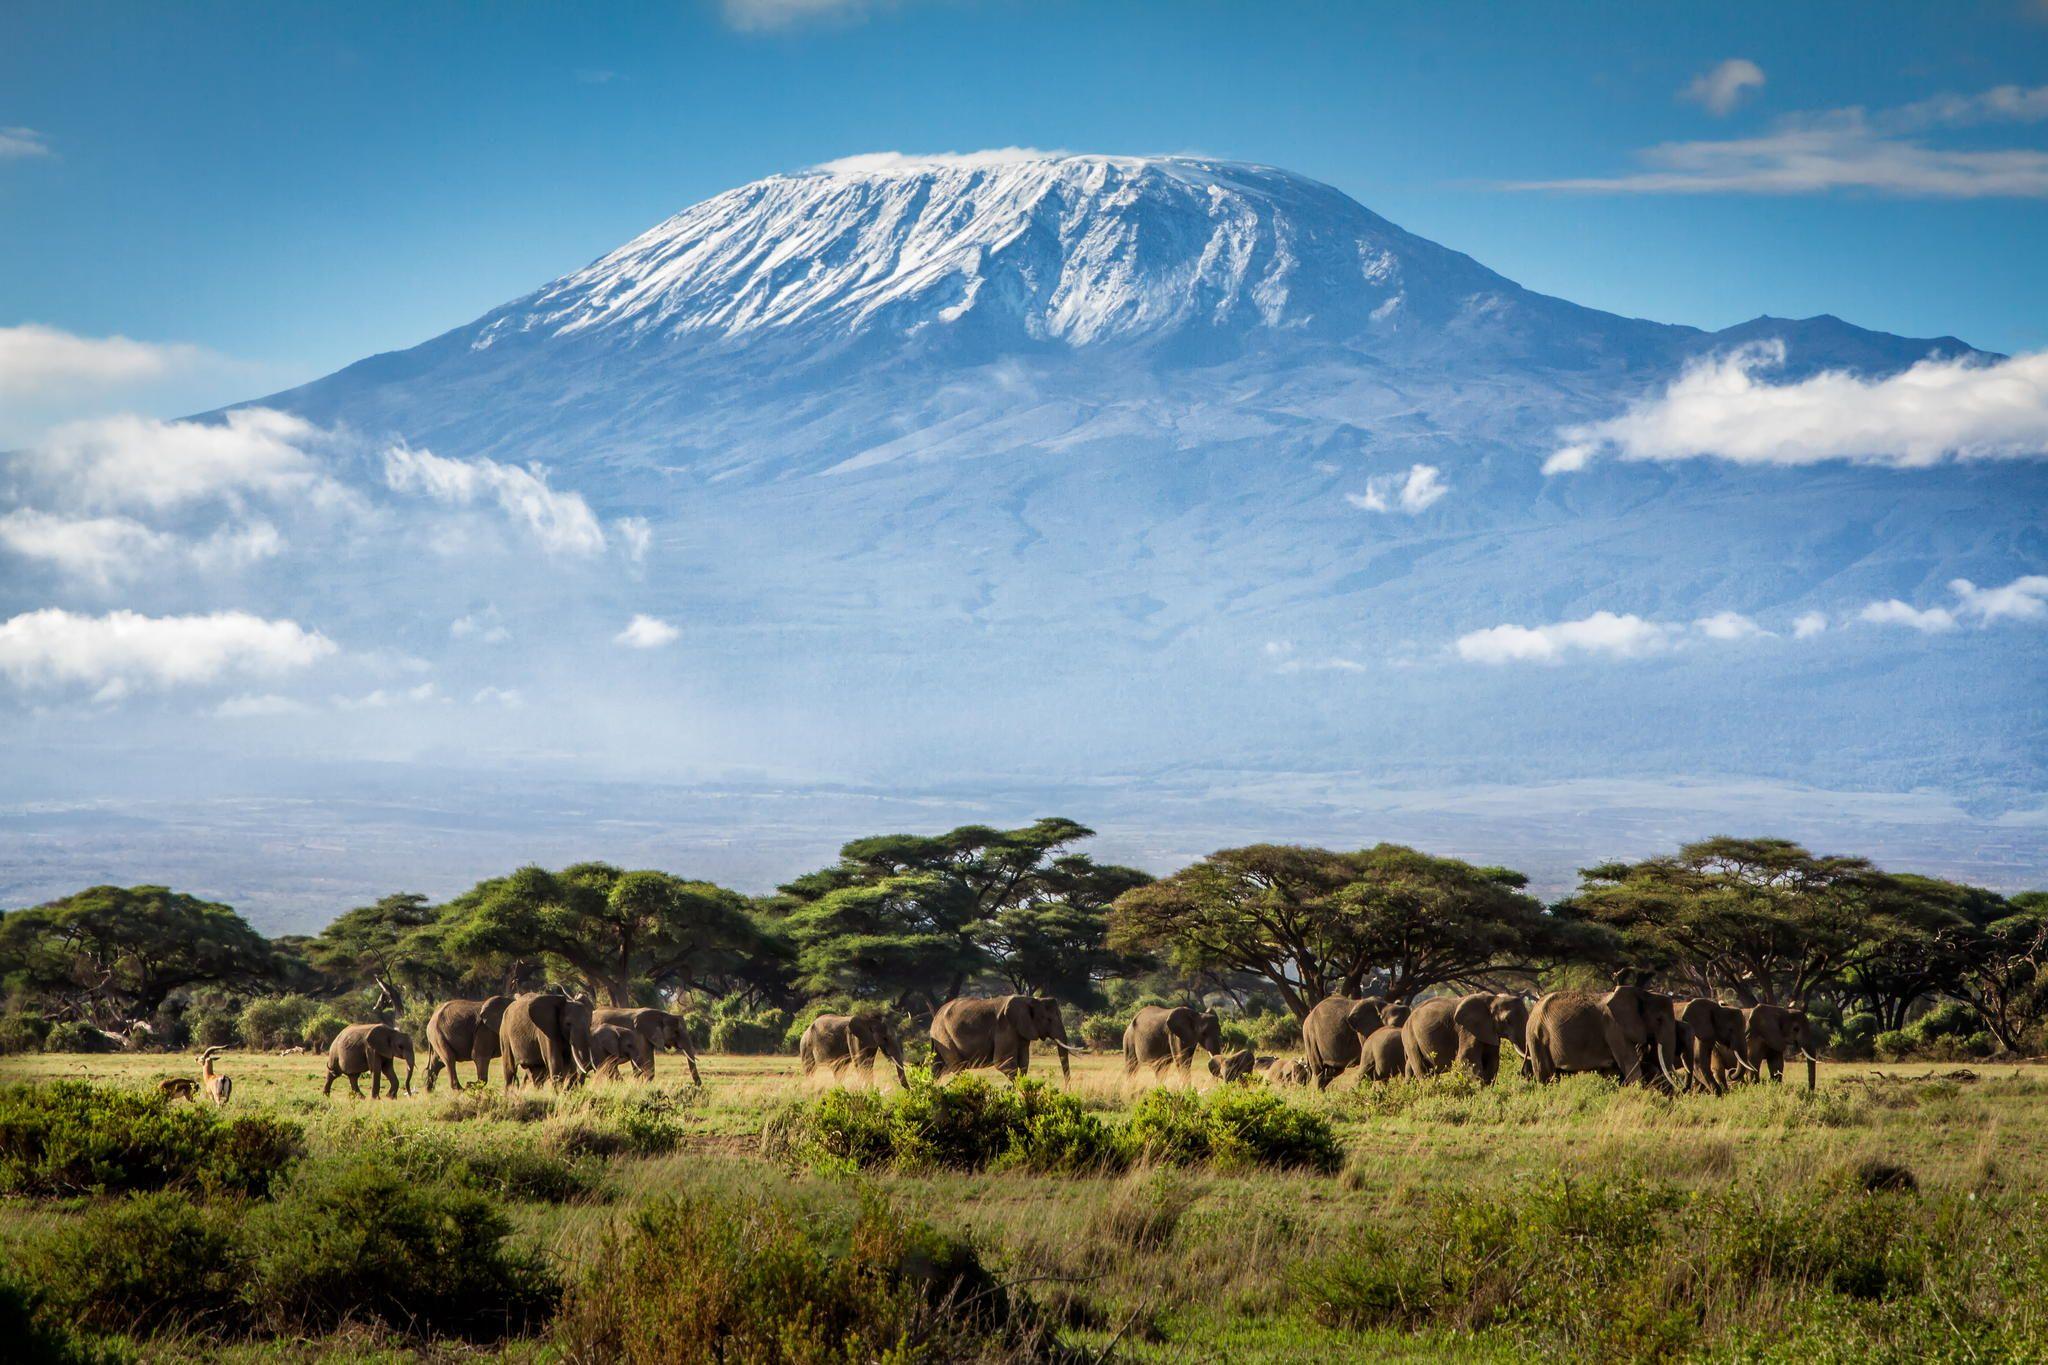 kenya - Afrikas Största Länder